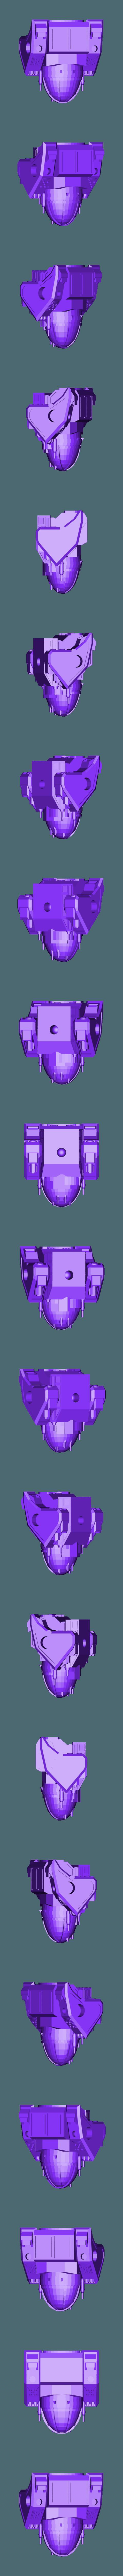 Torso_2.stl Download free STL file Modular Linebacker Mech • 3D printing object, mrhers2